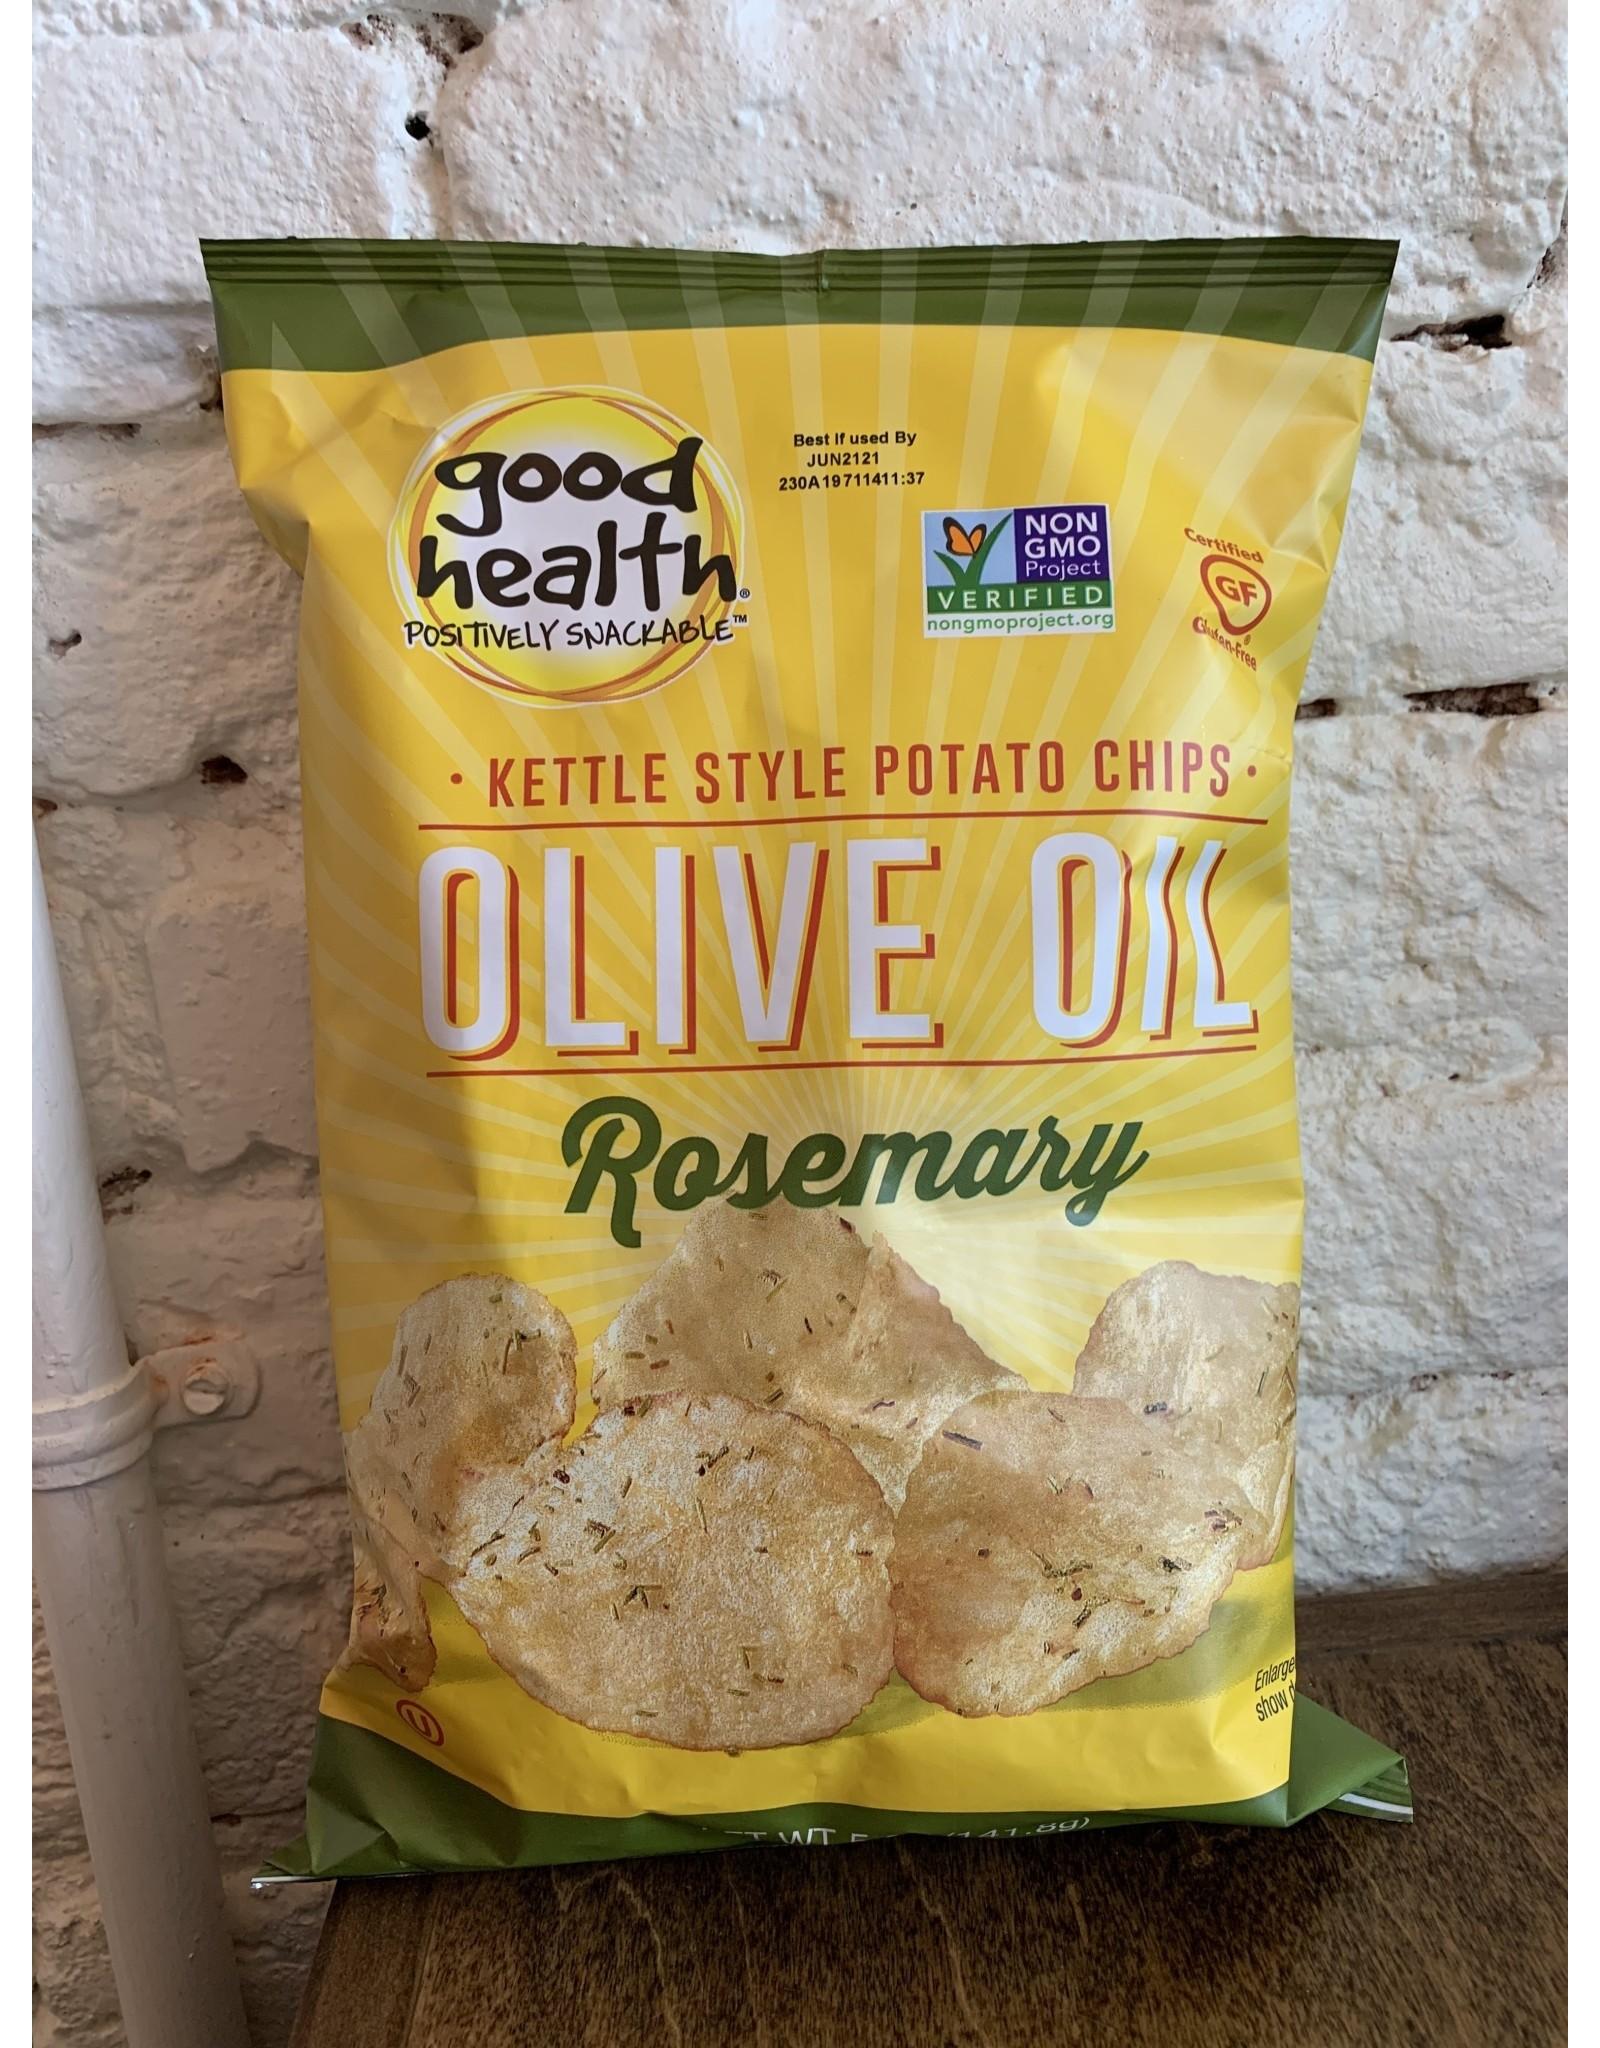 Good Health Good Health Potato Chips, Olive Oil & Rosemary 5oz. Bag